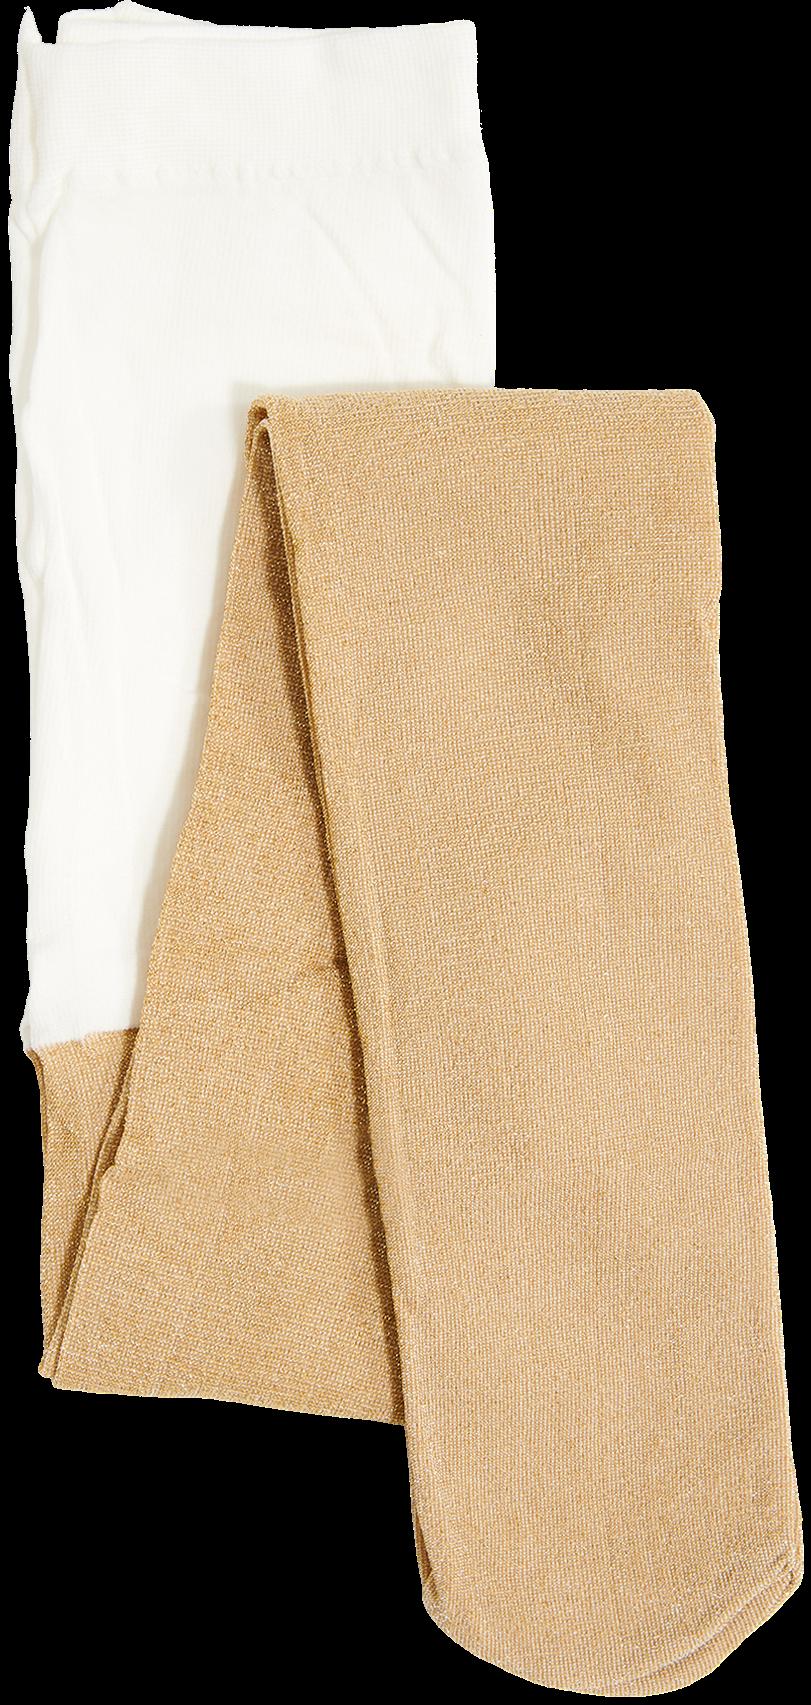 Goldfarbene LE BIG Socken SPARKLE TIGHT alYoN